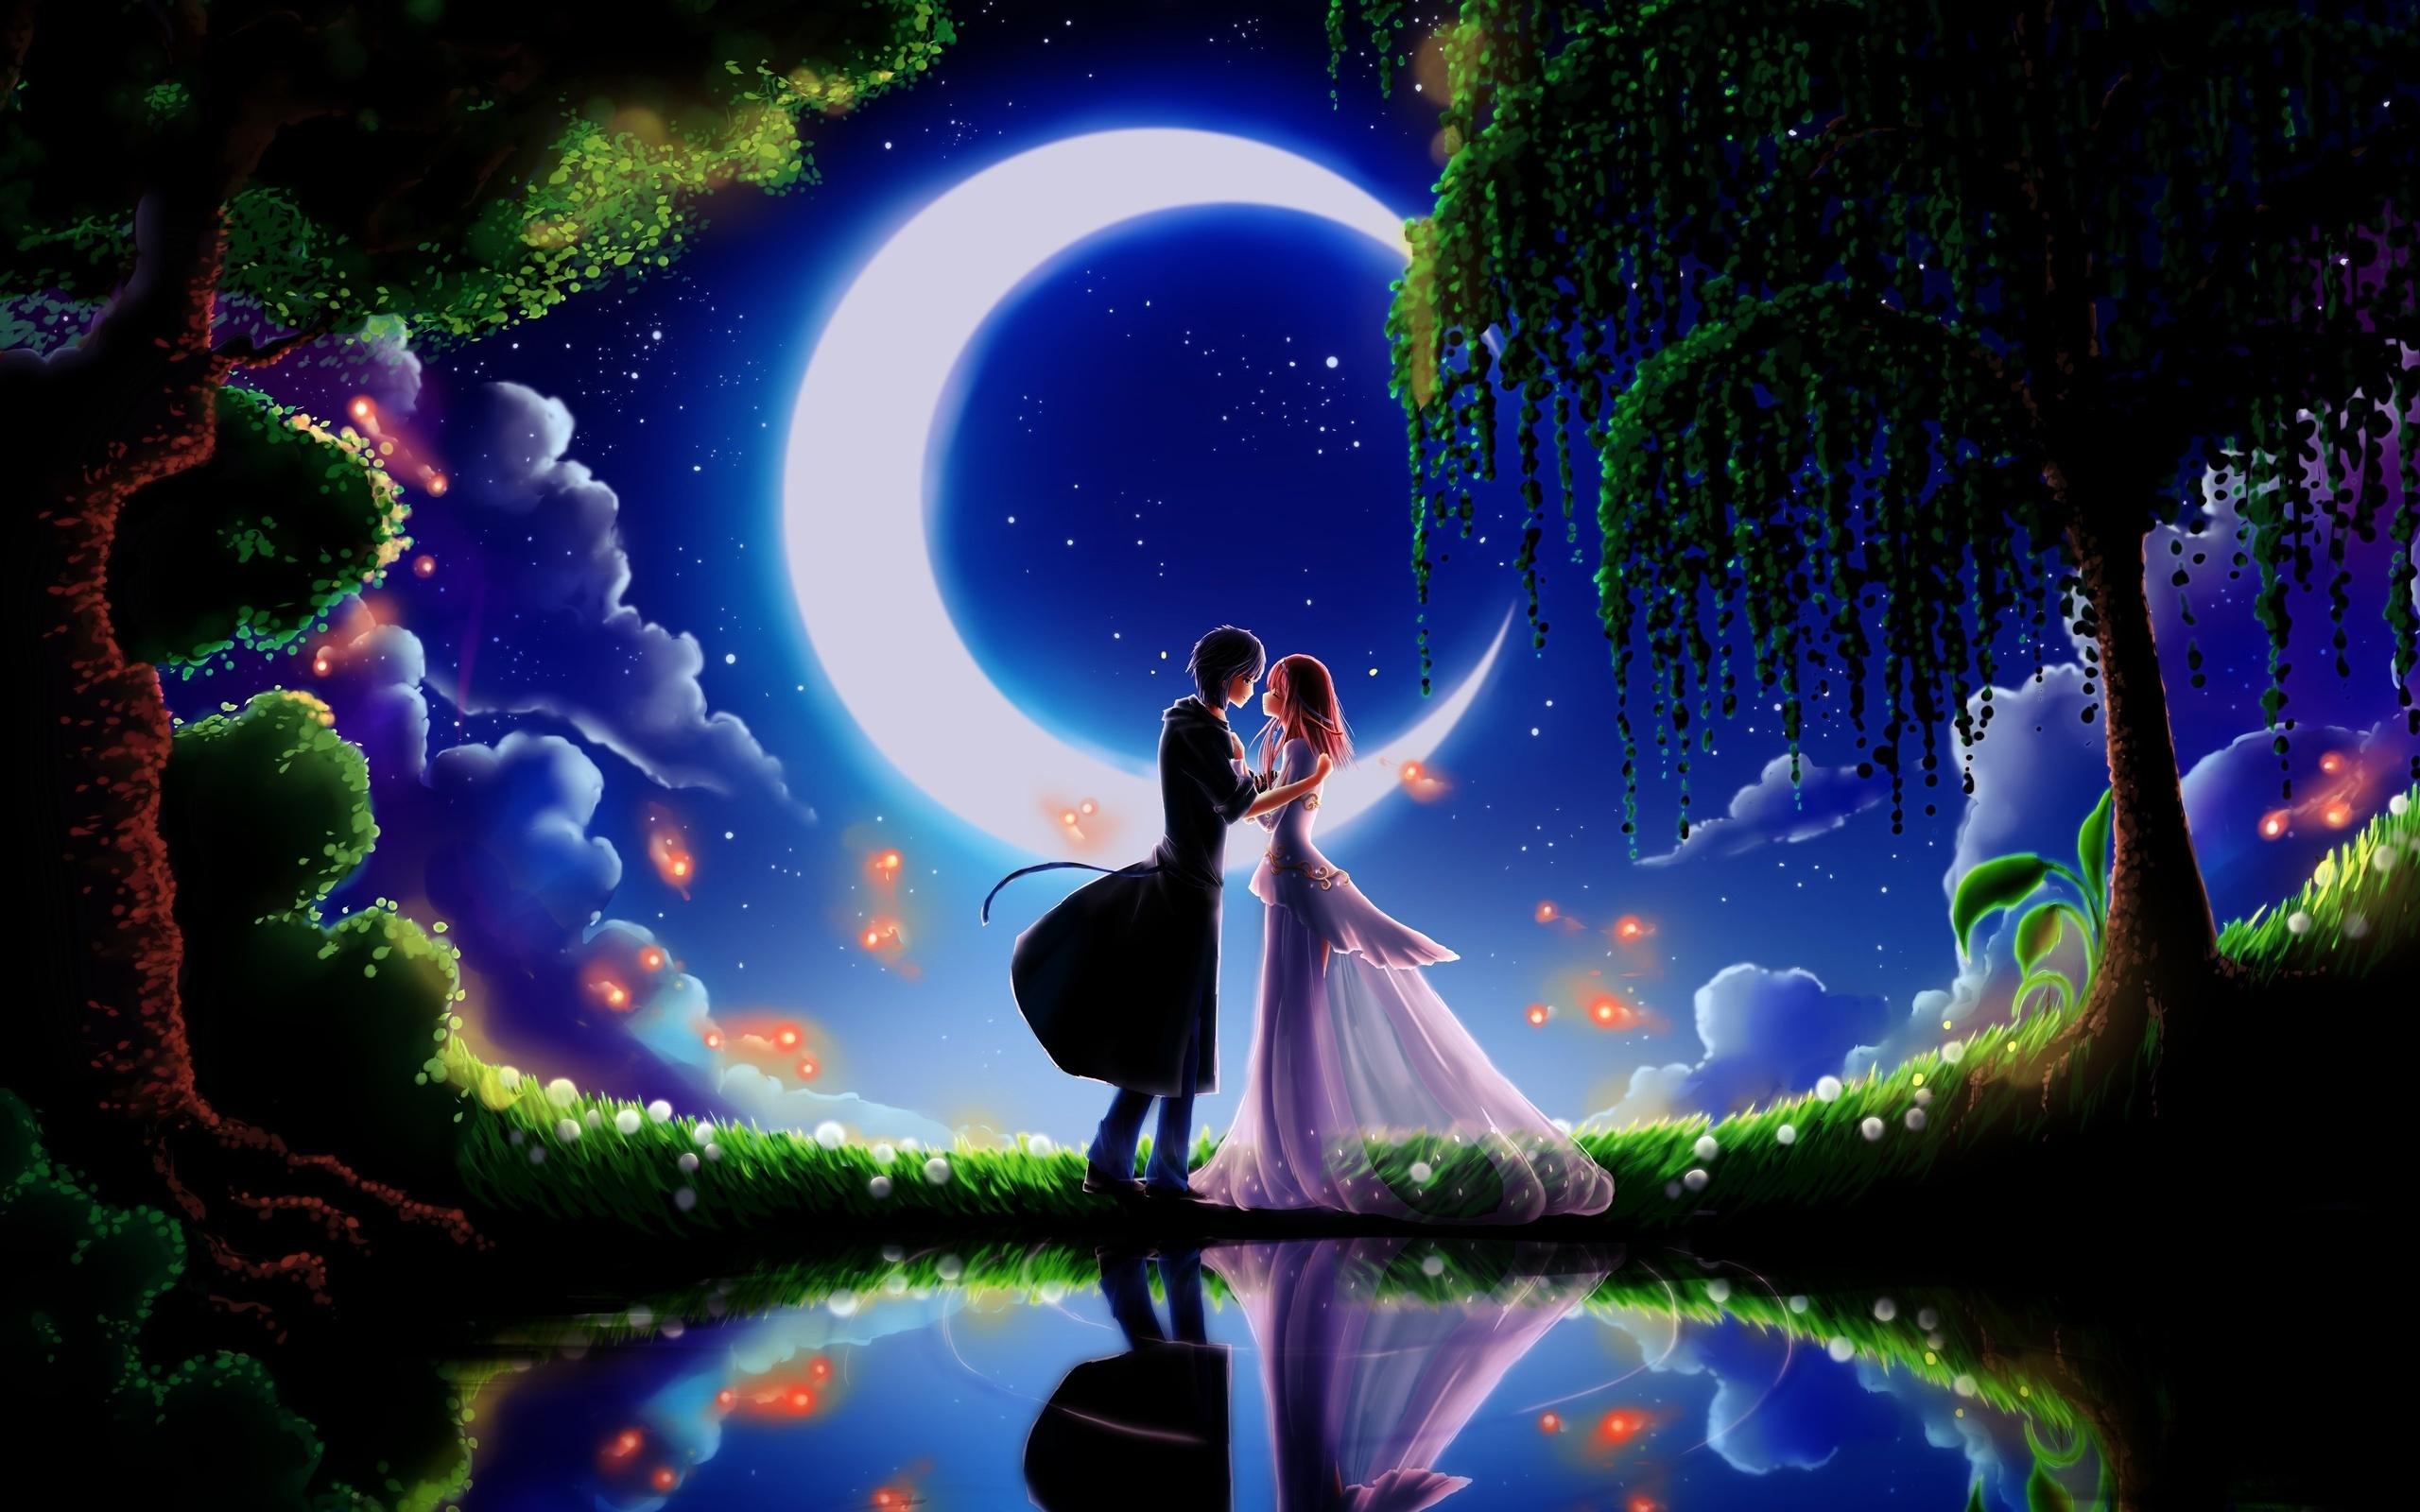 Romance Couple Wallpaper Hd Greenmamahk Store Magecloud Net